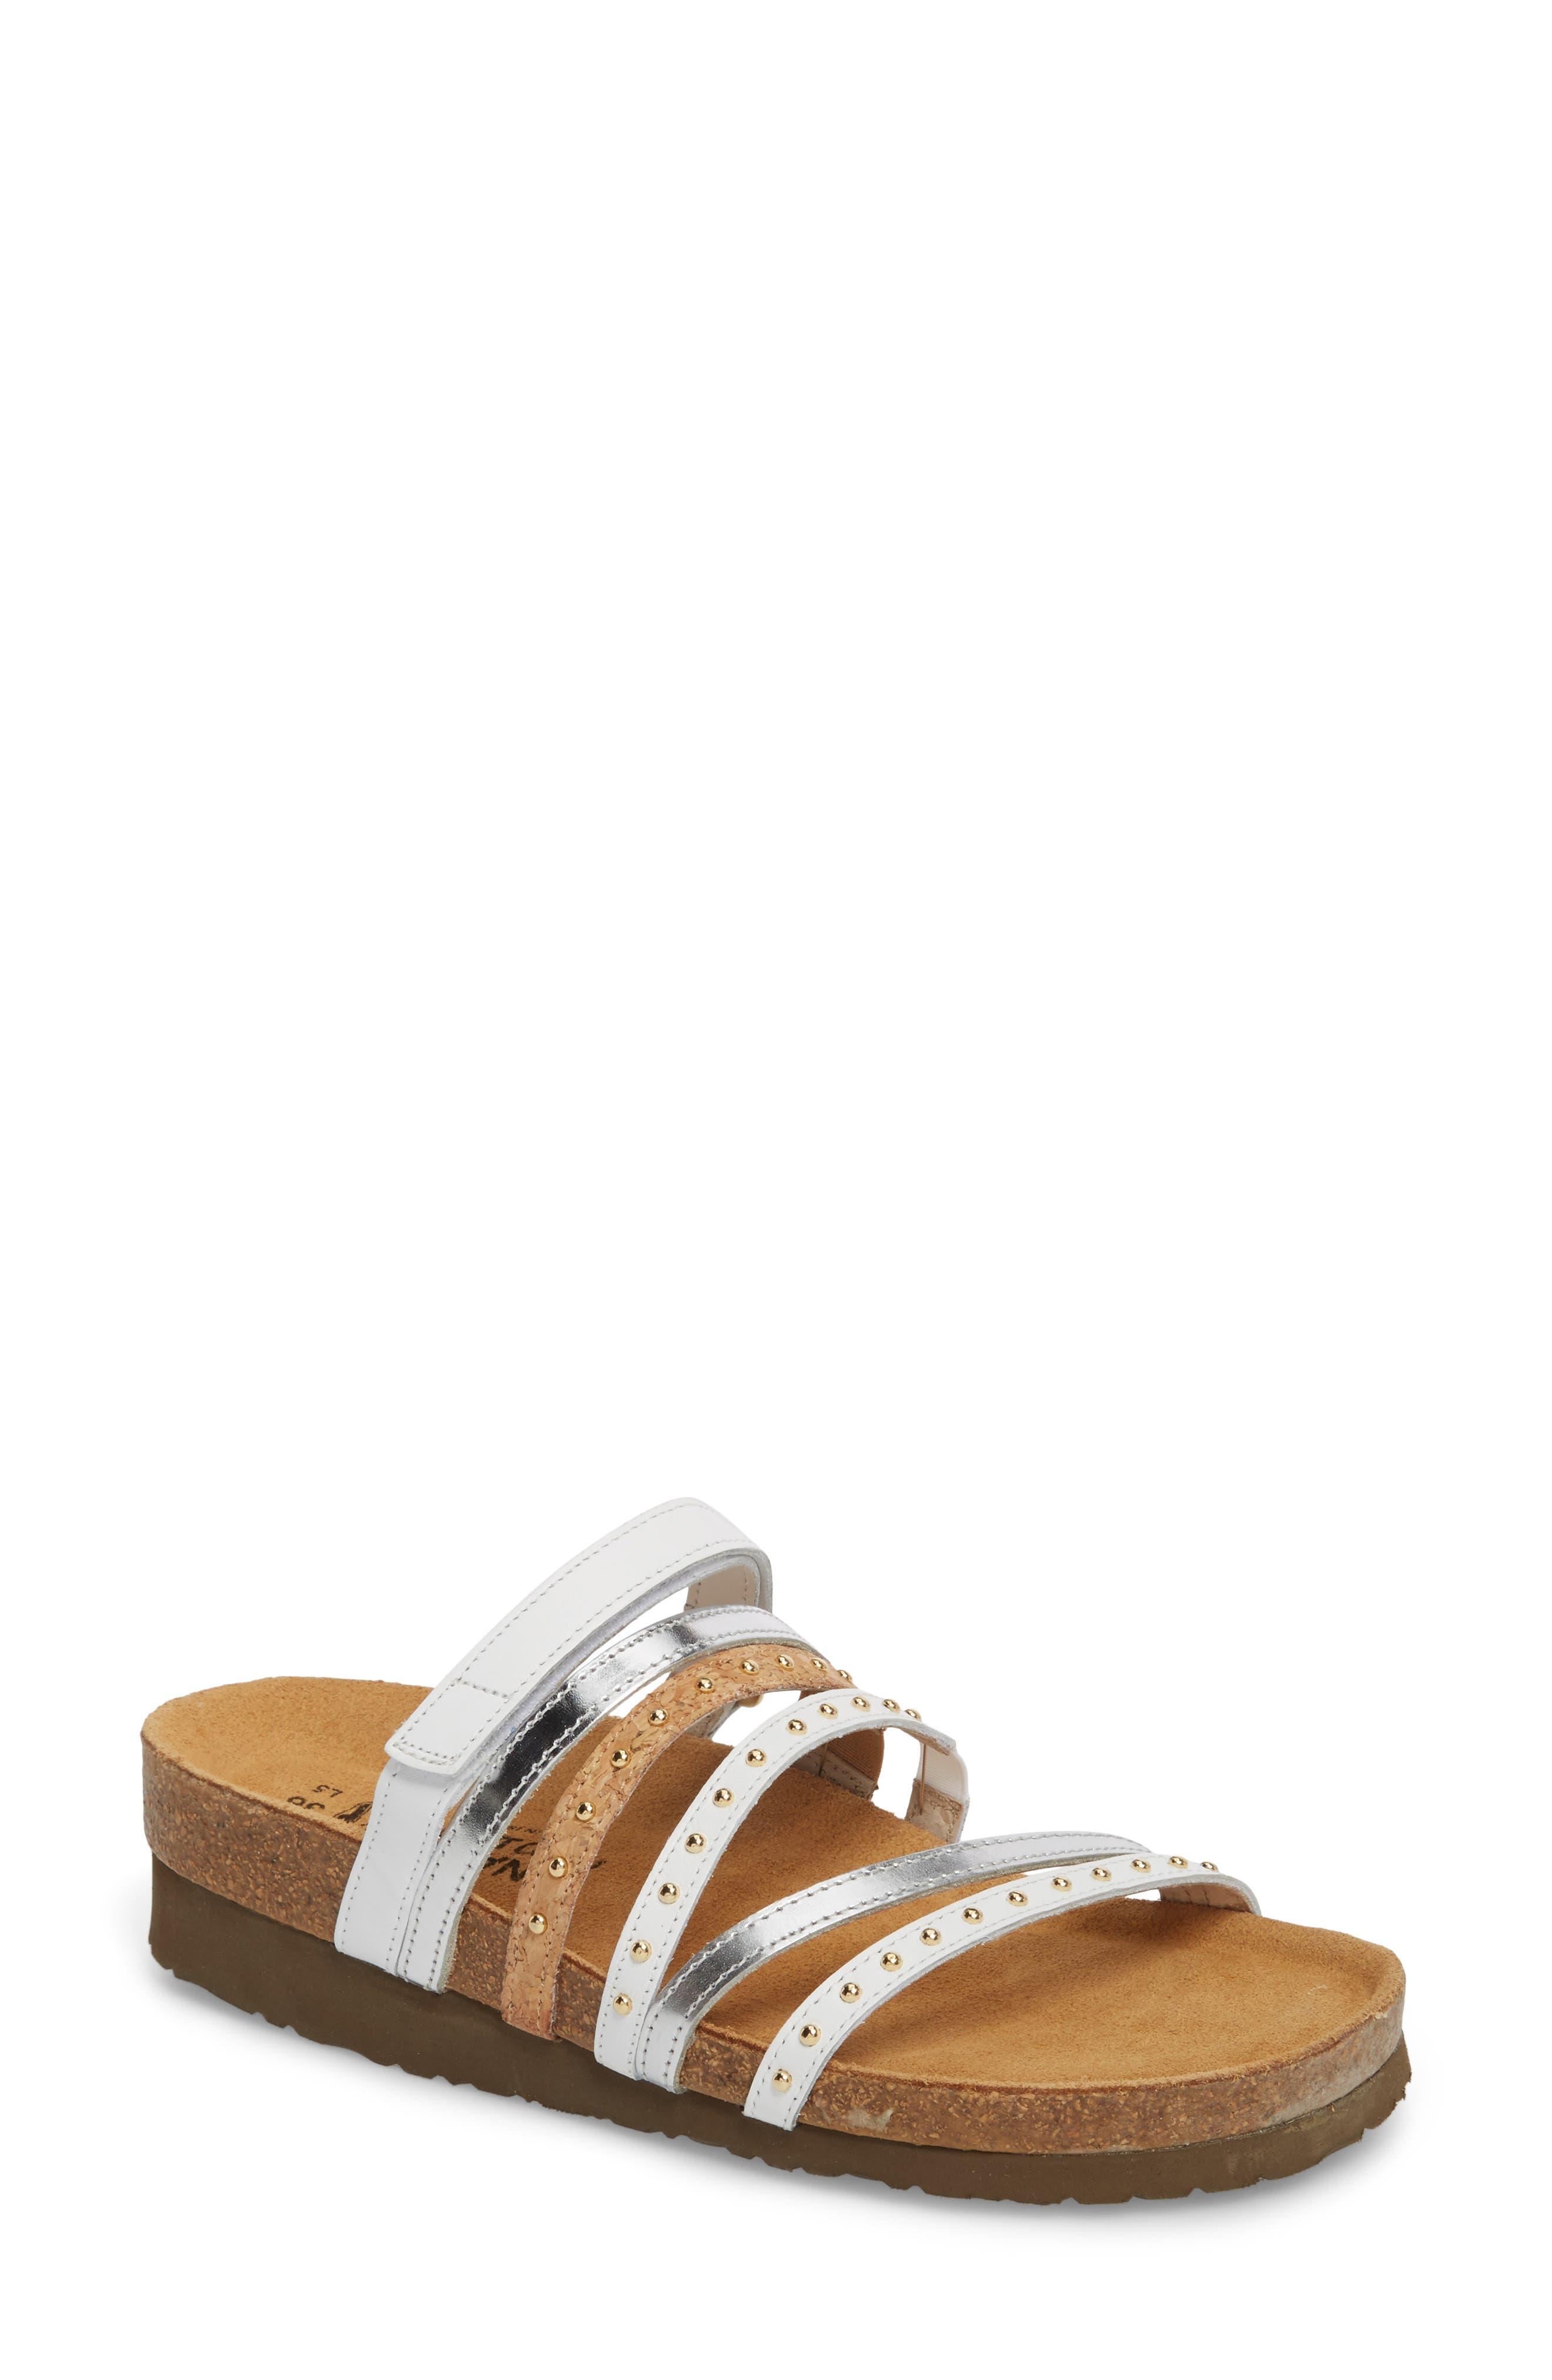 Prescott Sandal,                         Main,                         color, White/ Silver Leather